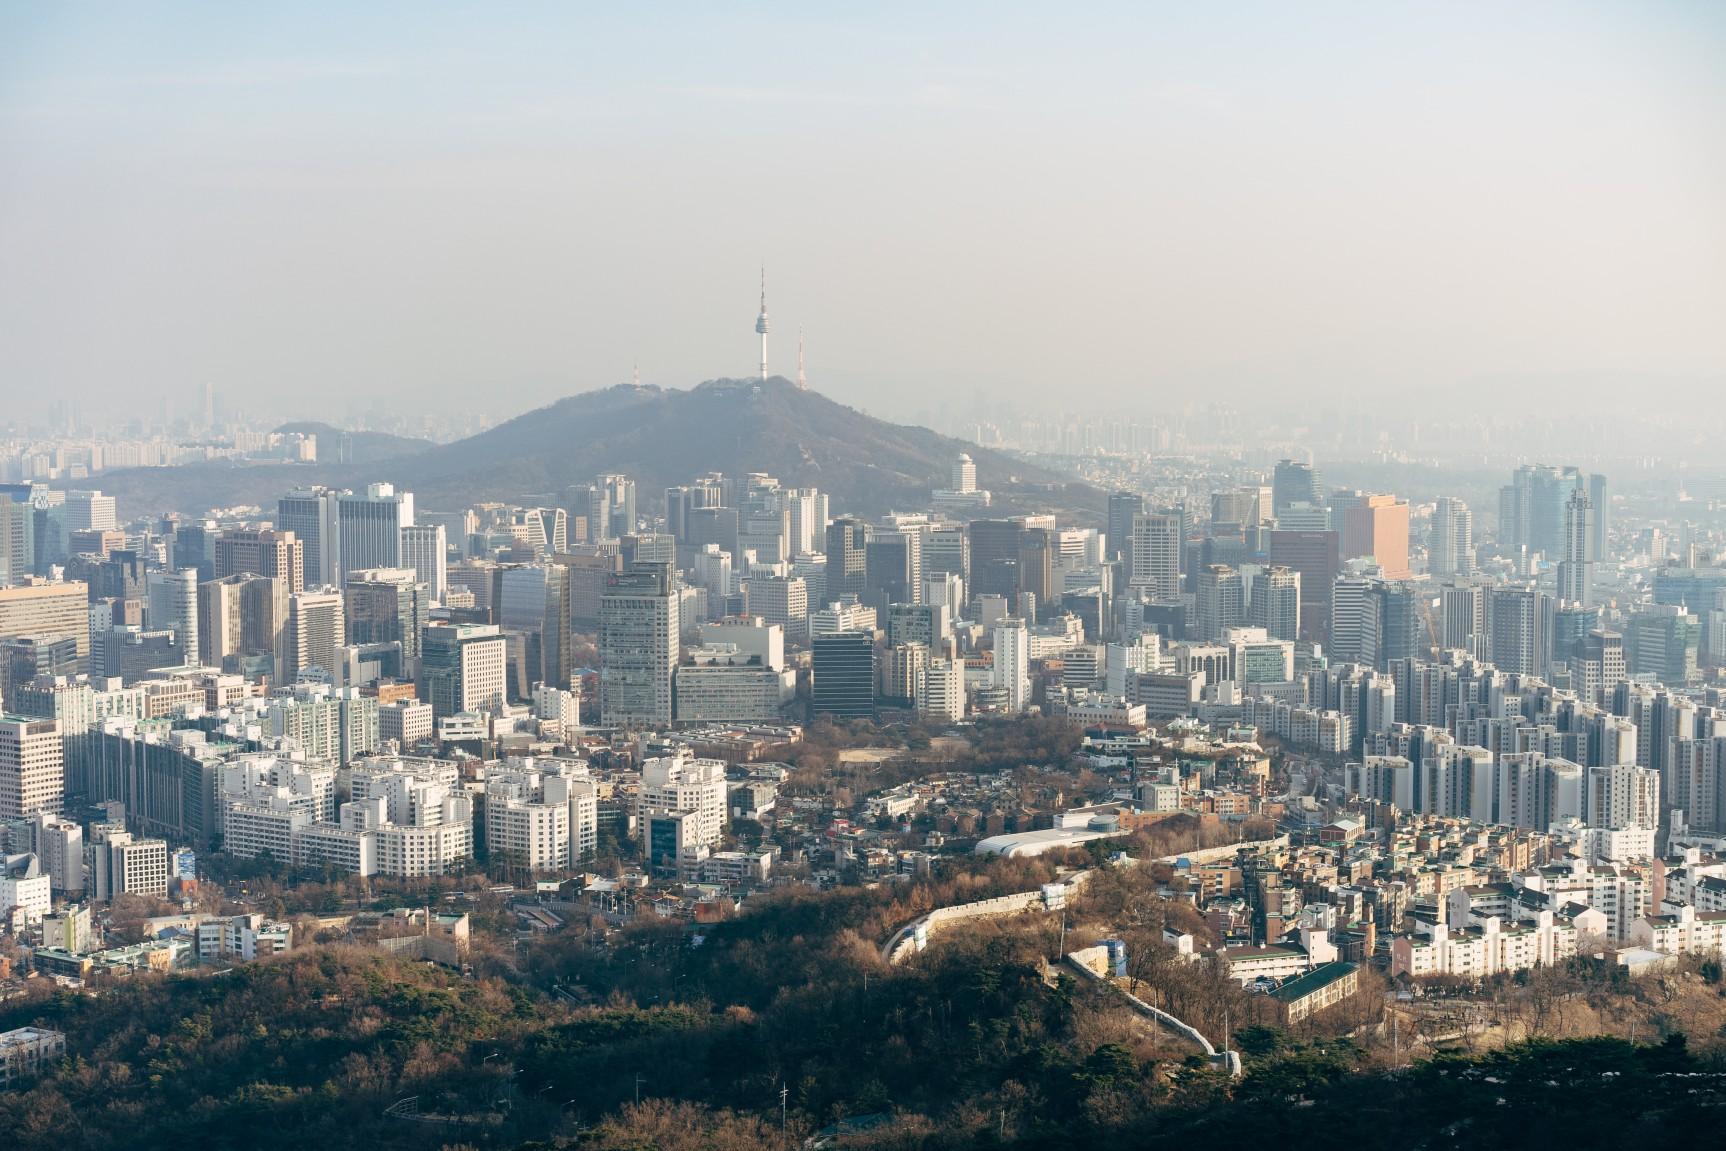 South Korea's Love for Hiking